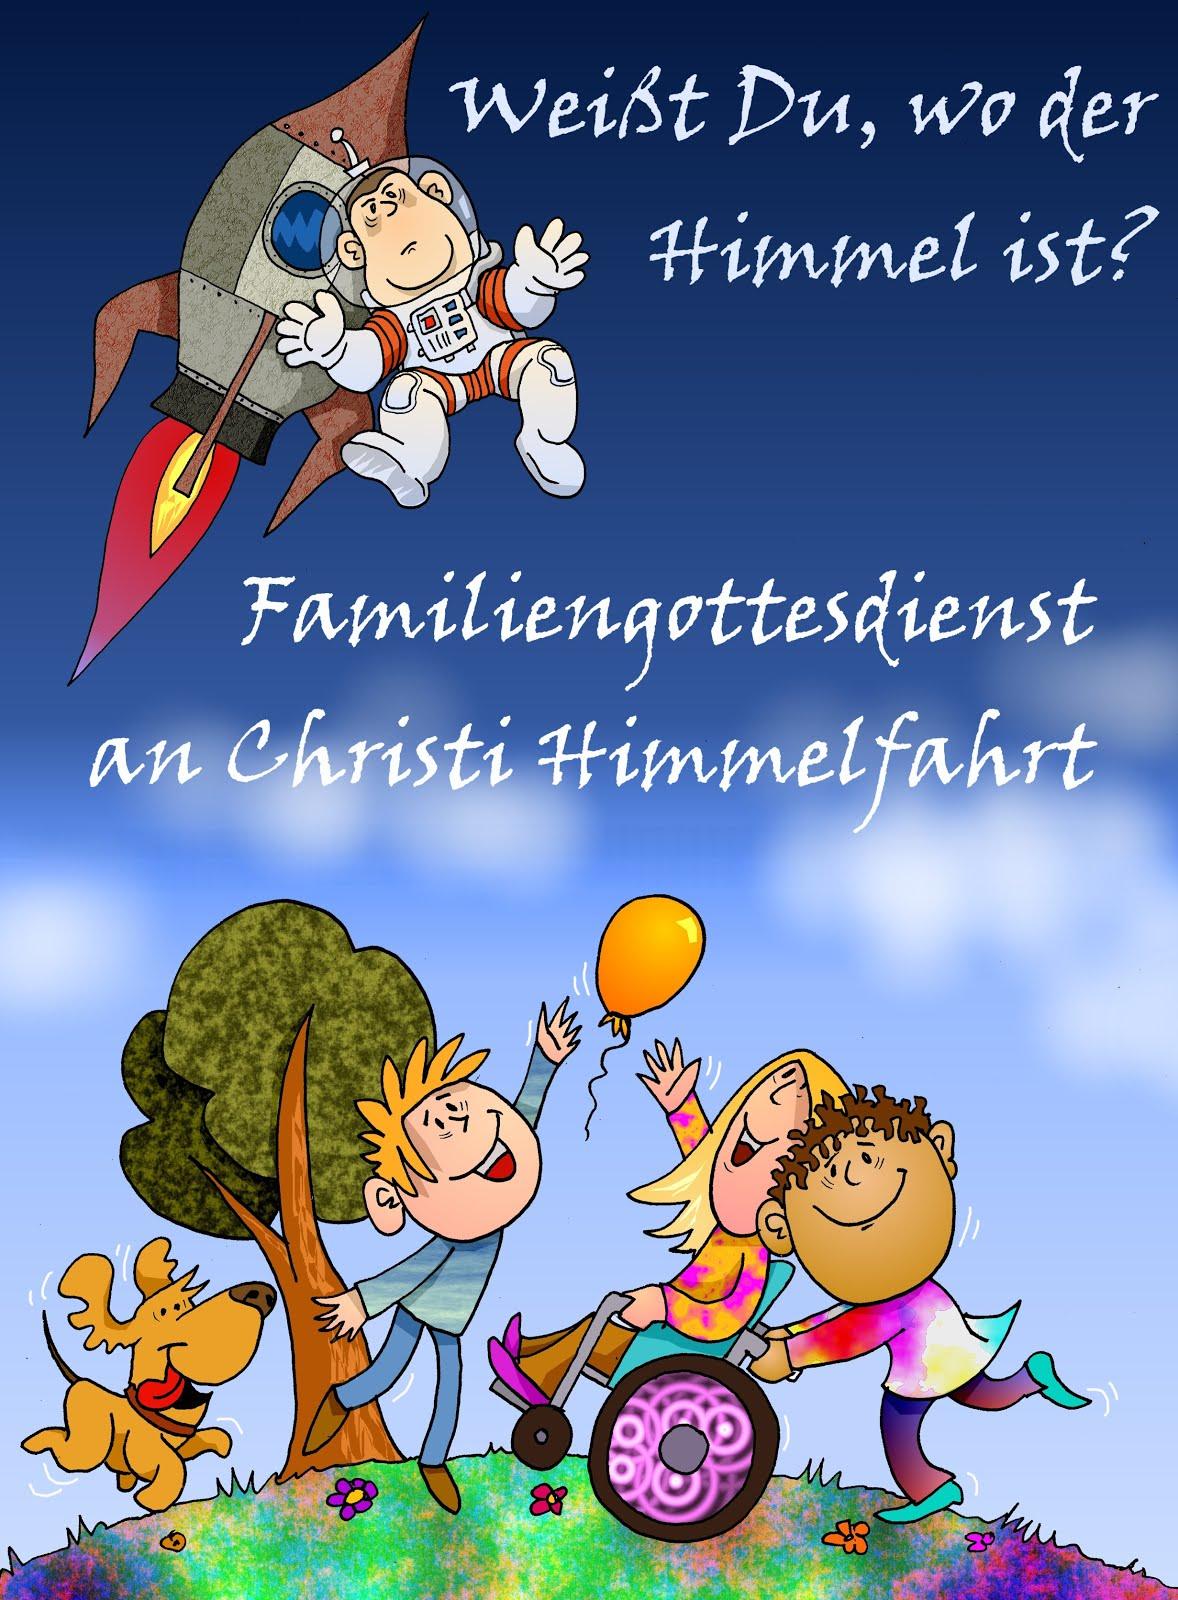 Christi Himmelfahrt 2018